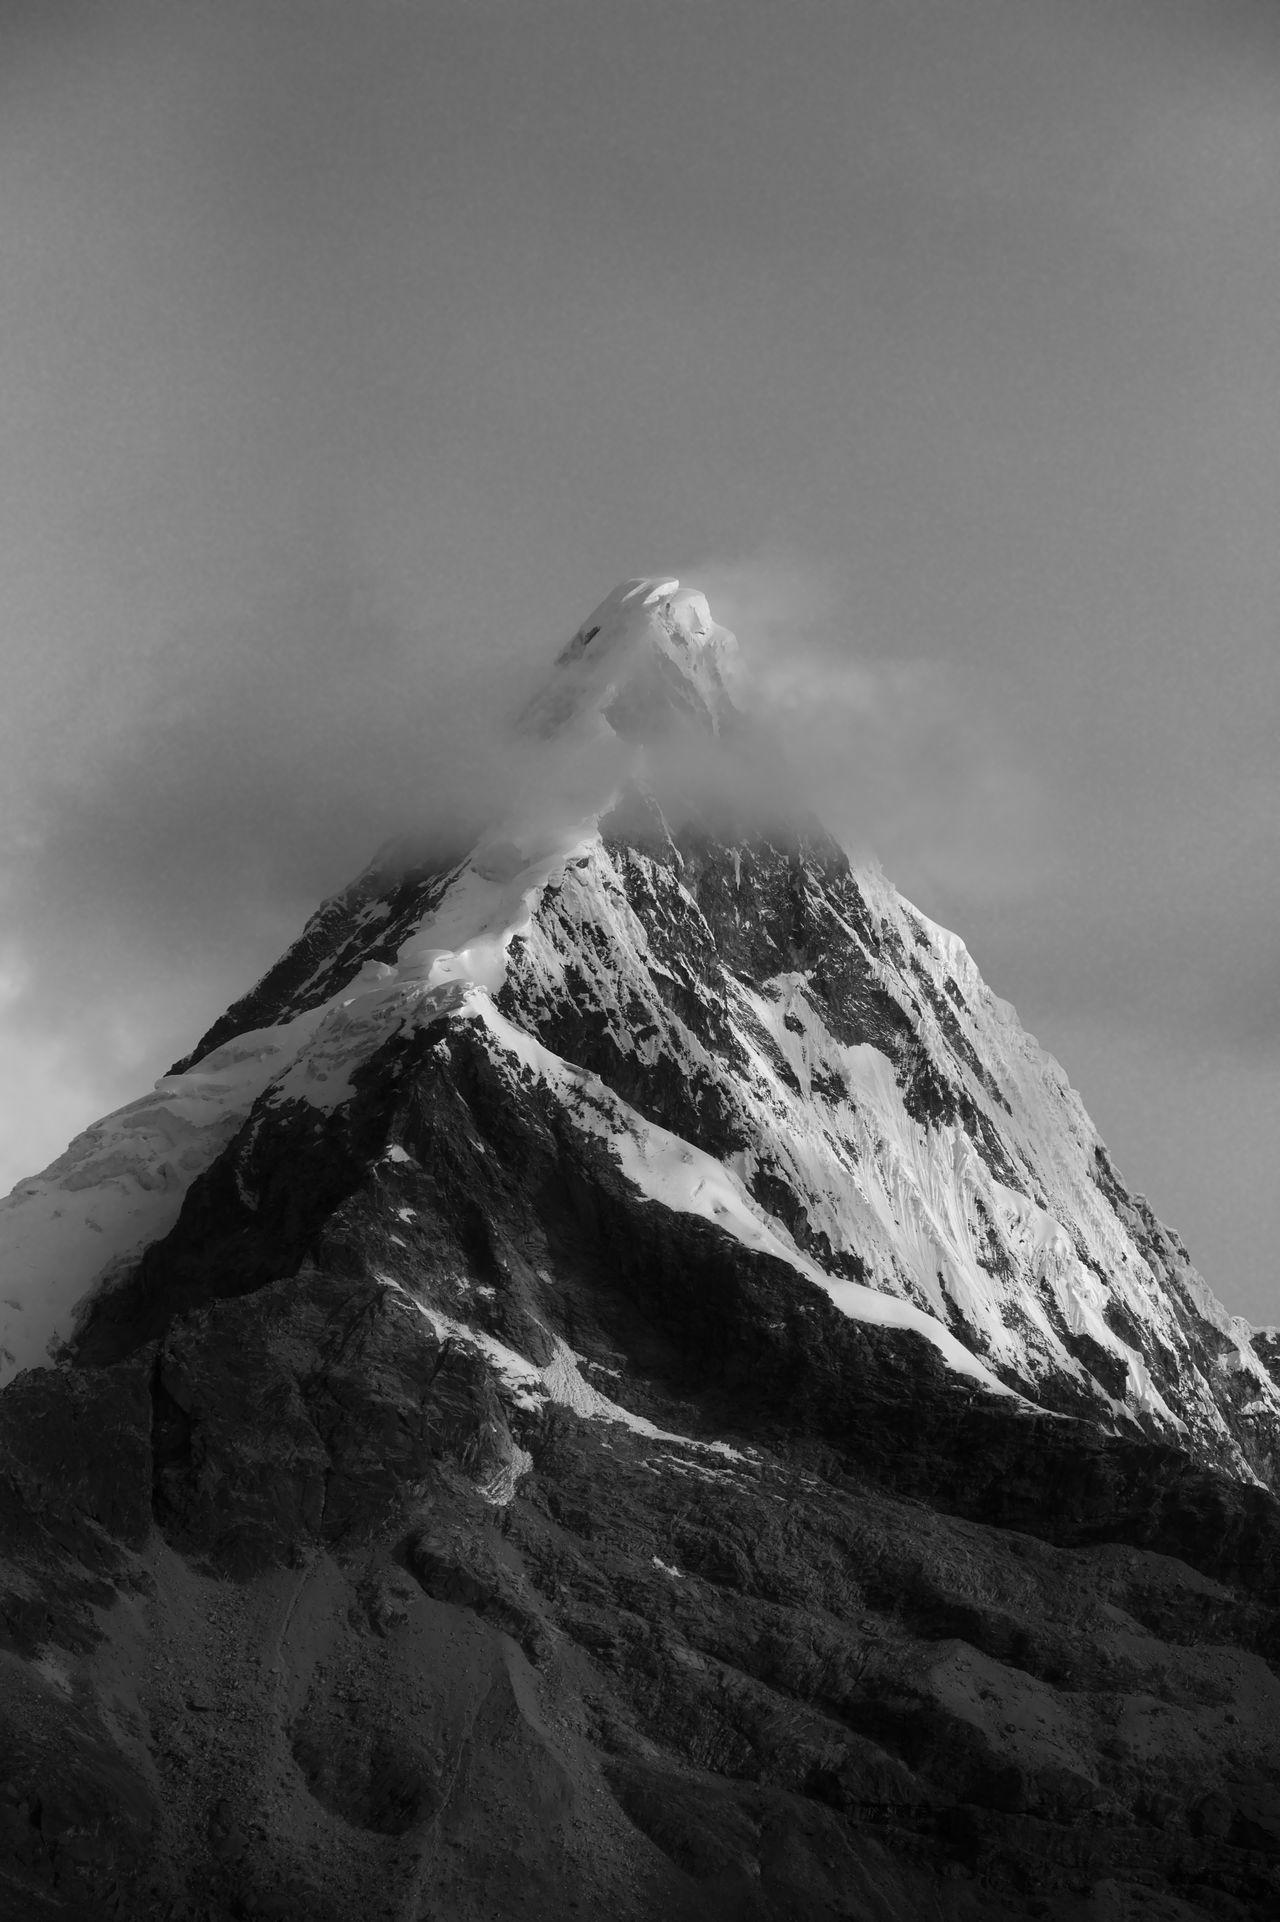 mountain, snow, cold temperature, winter, sky